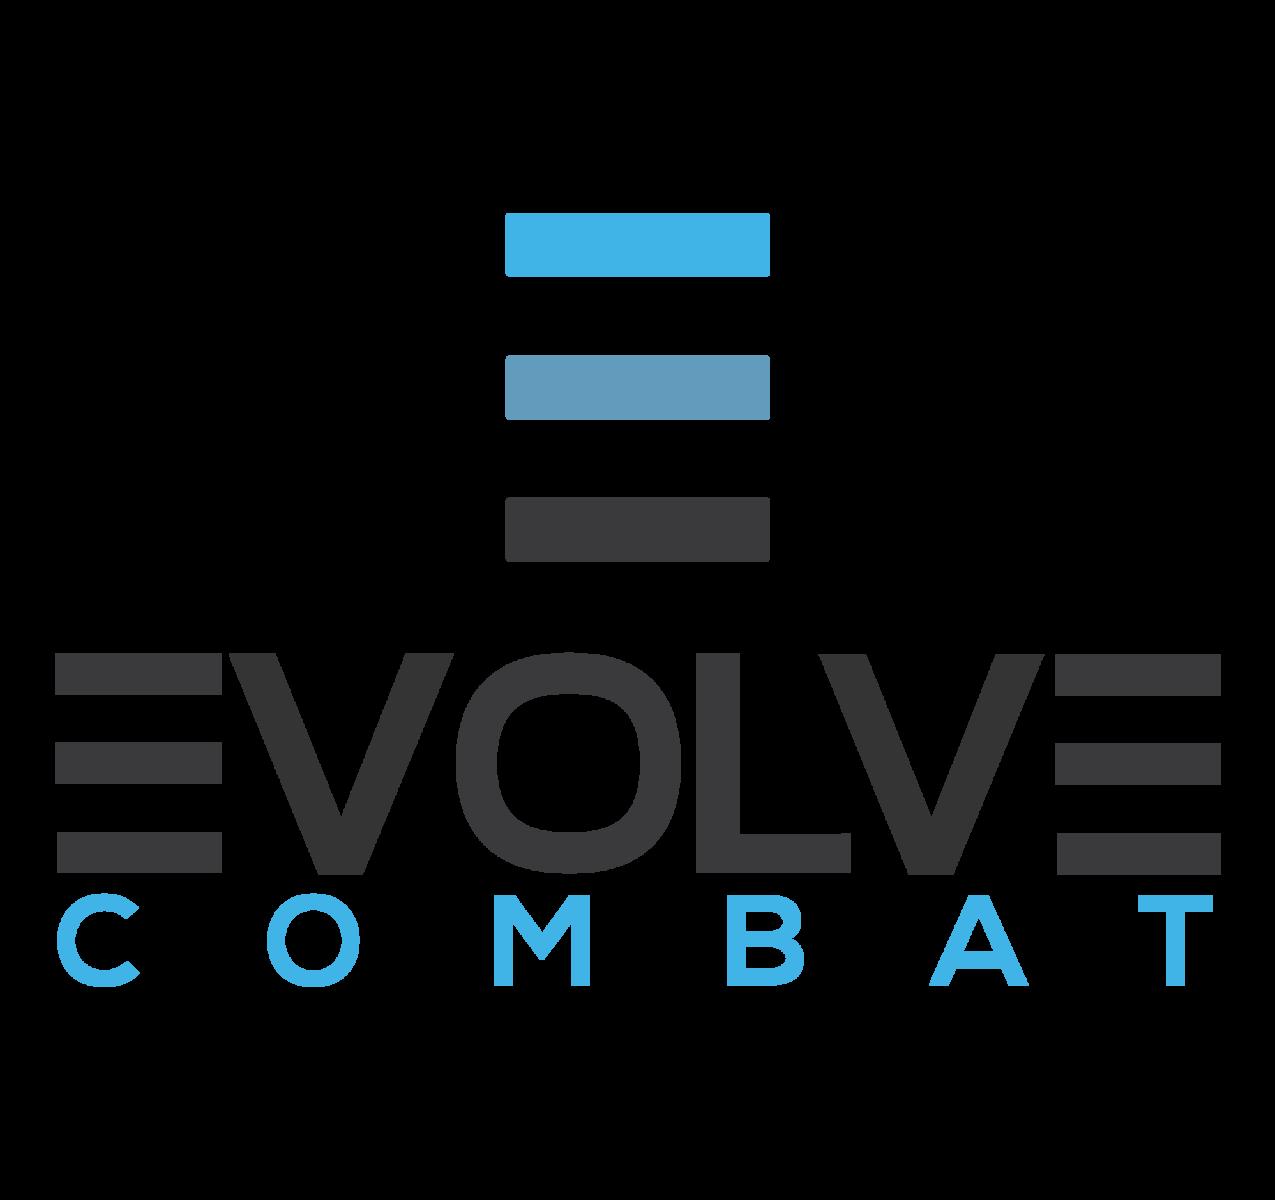 Evolve Combat